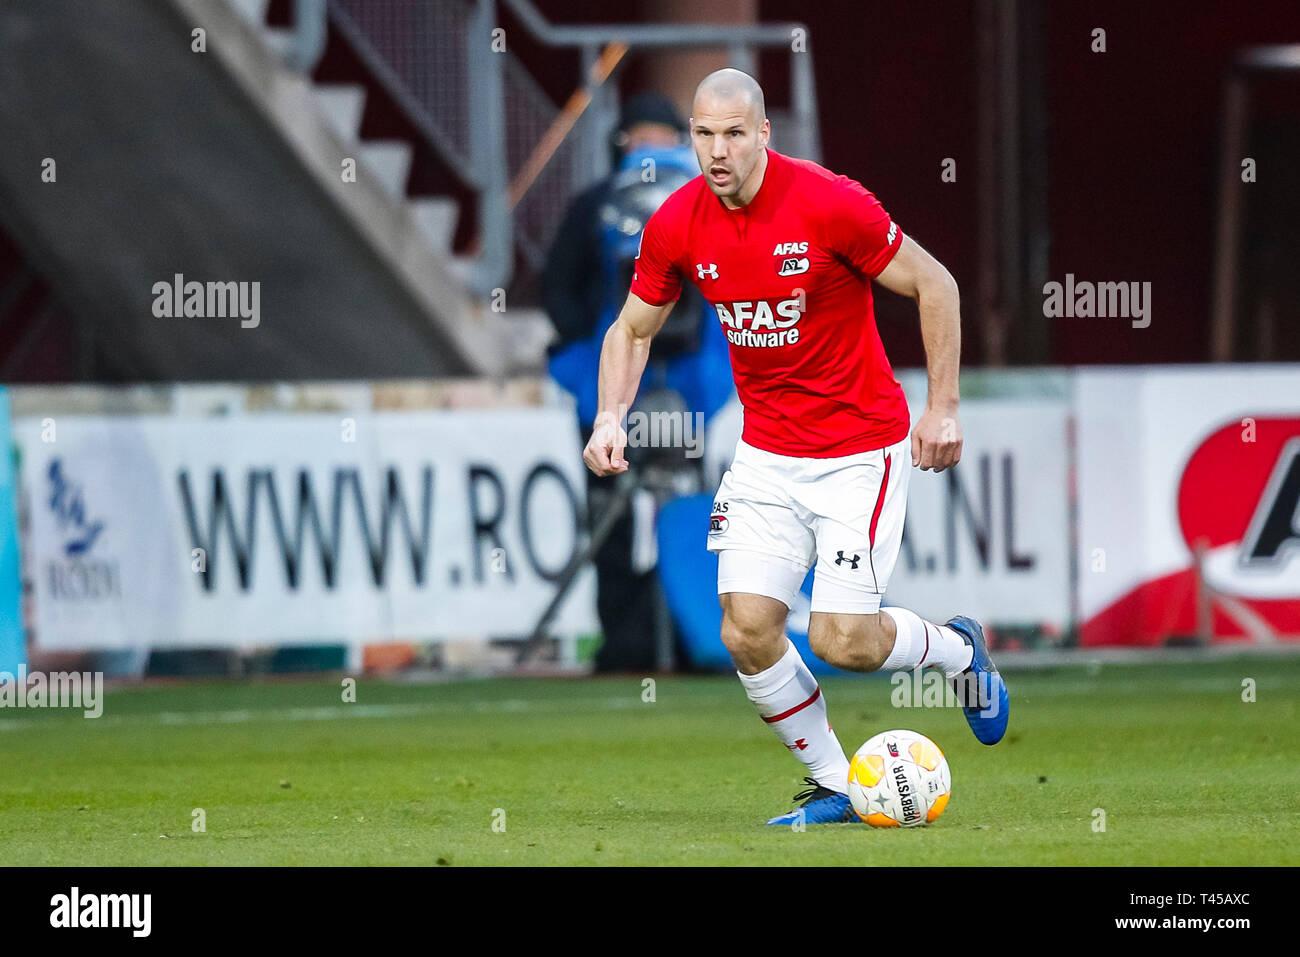 Alkmaar Az Ado Den Haag 13 04 2019 Football Dutch Eredivisie Season 2018 2019 Afas Stadium Az Player Ron Vlaar Stock Photo Alamy